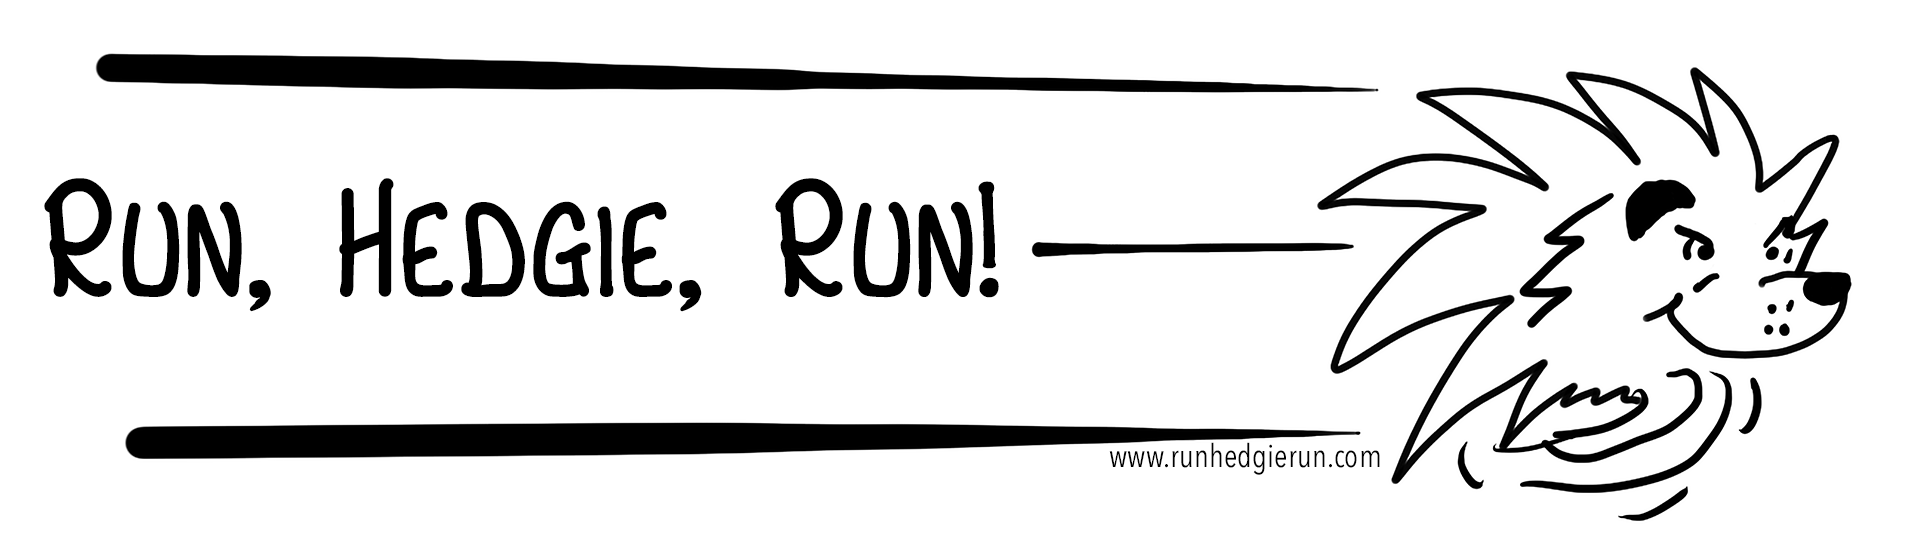 Run, Hedgie, Run!